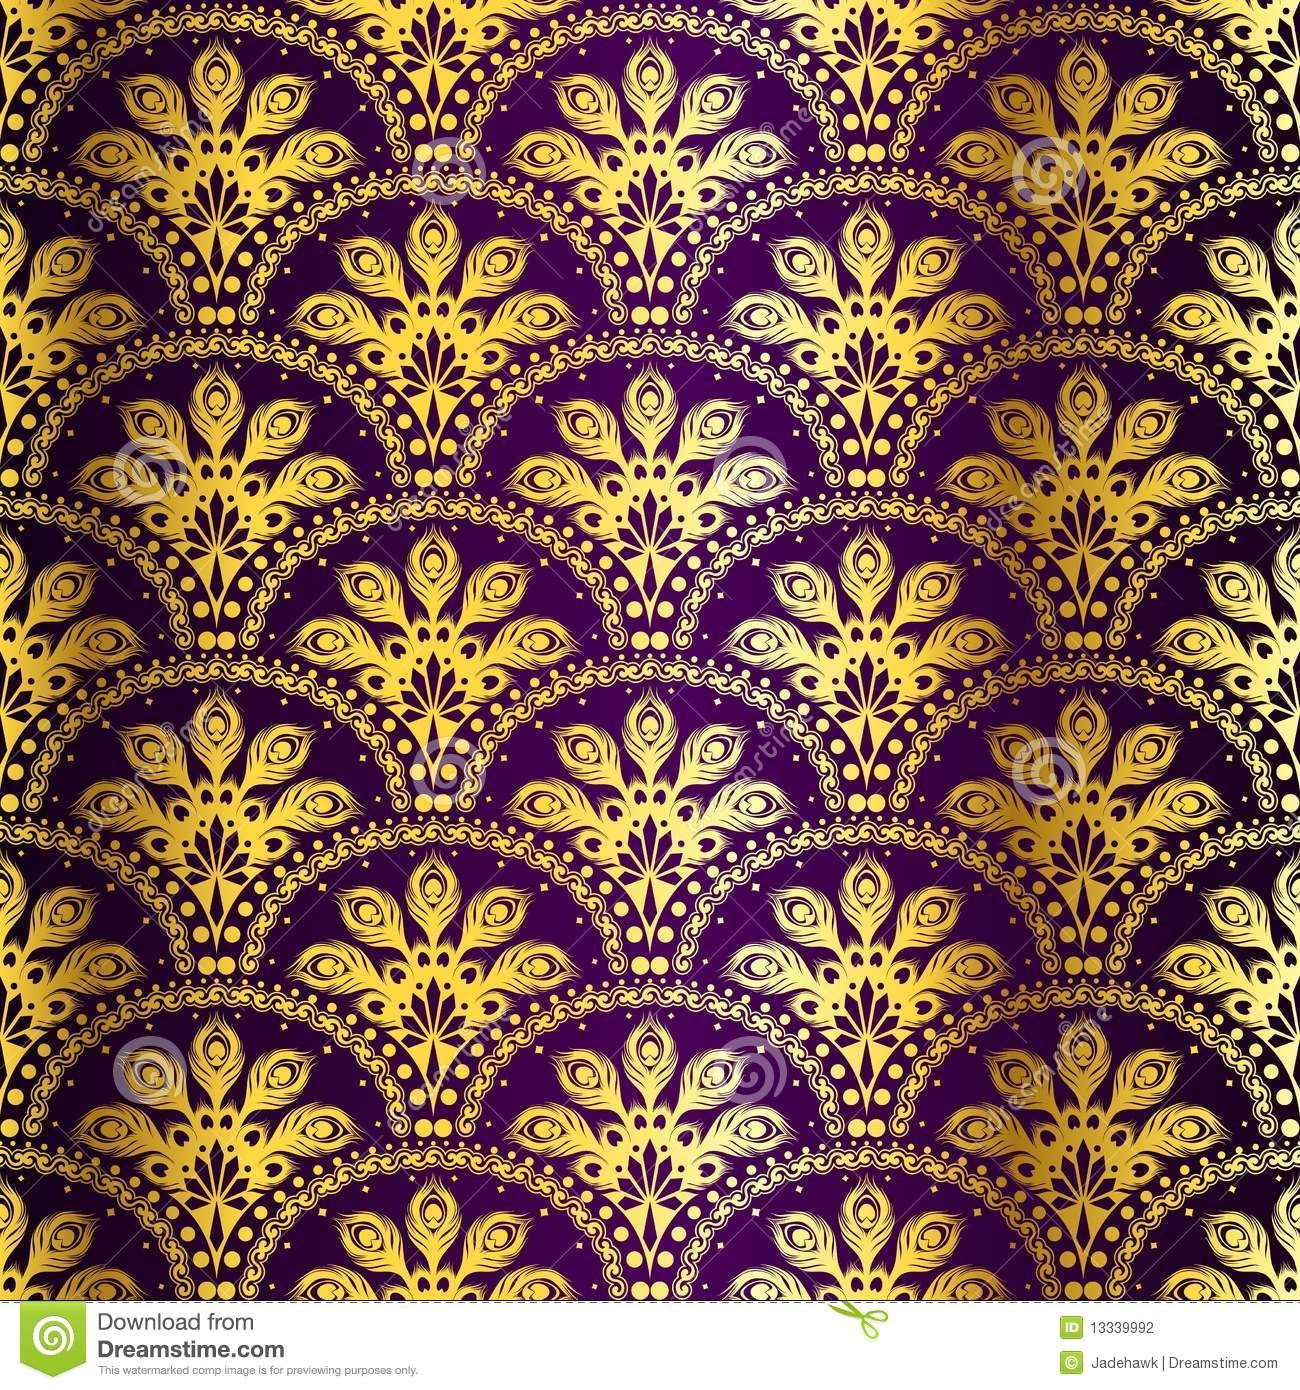 saree printed fabric - Google Search   Henna   Pinterest ...